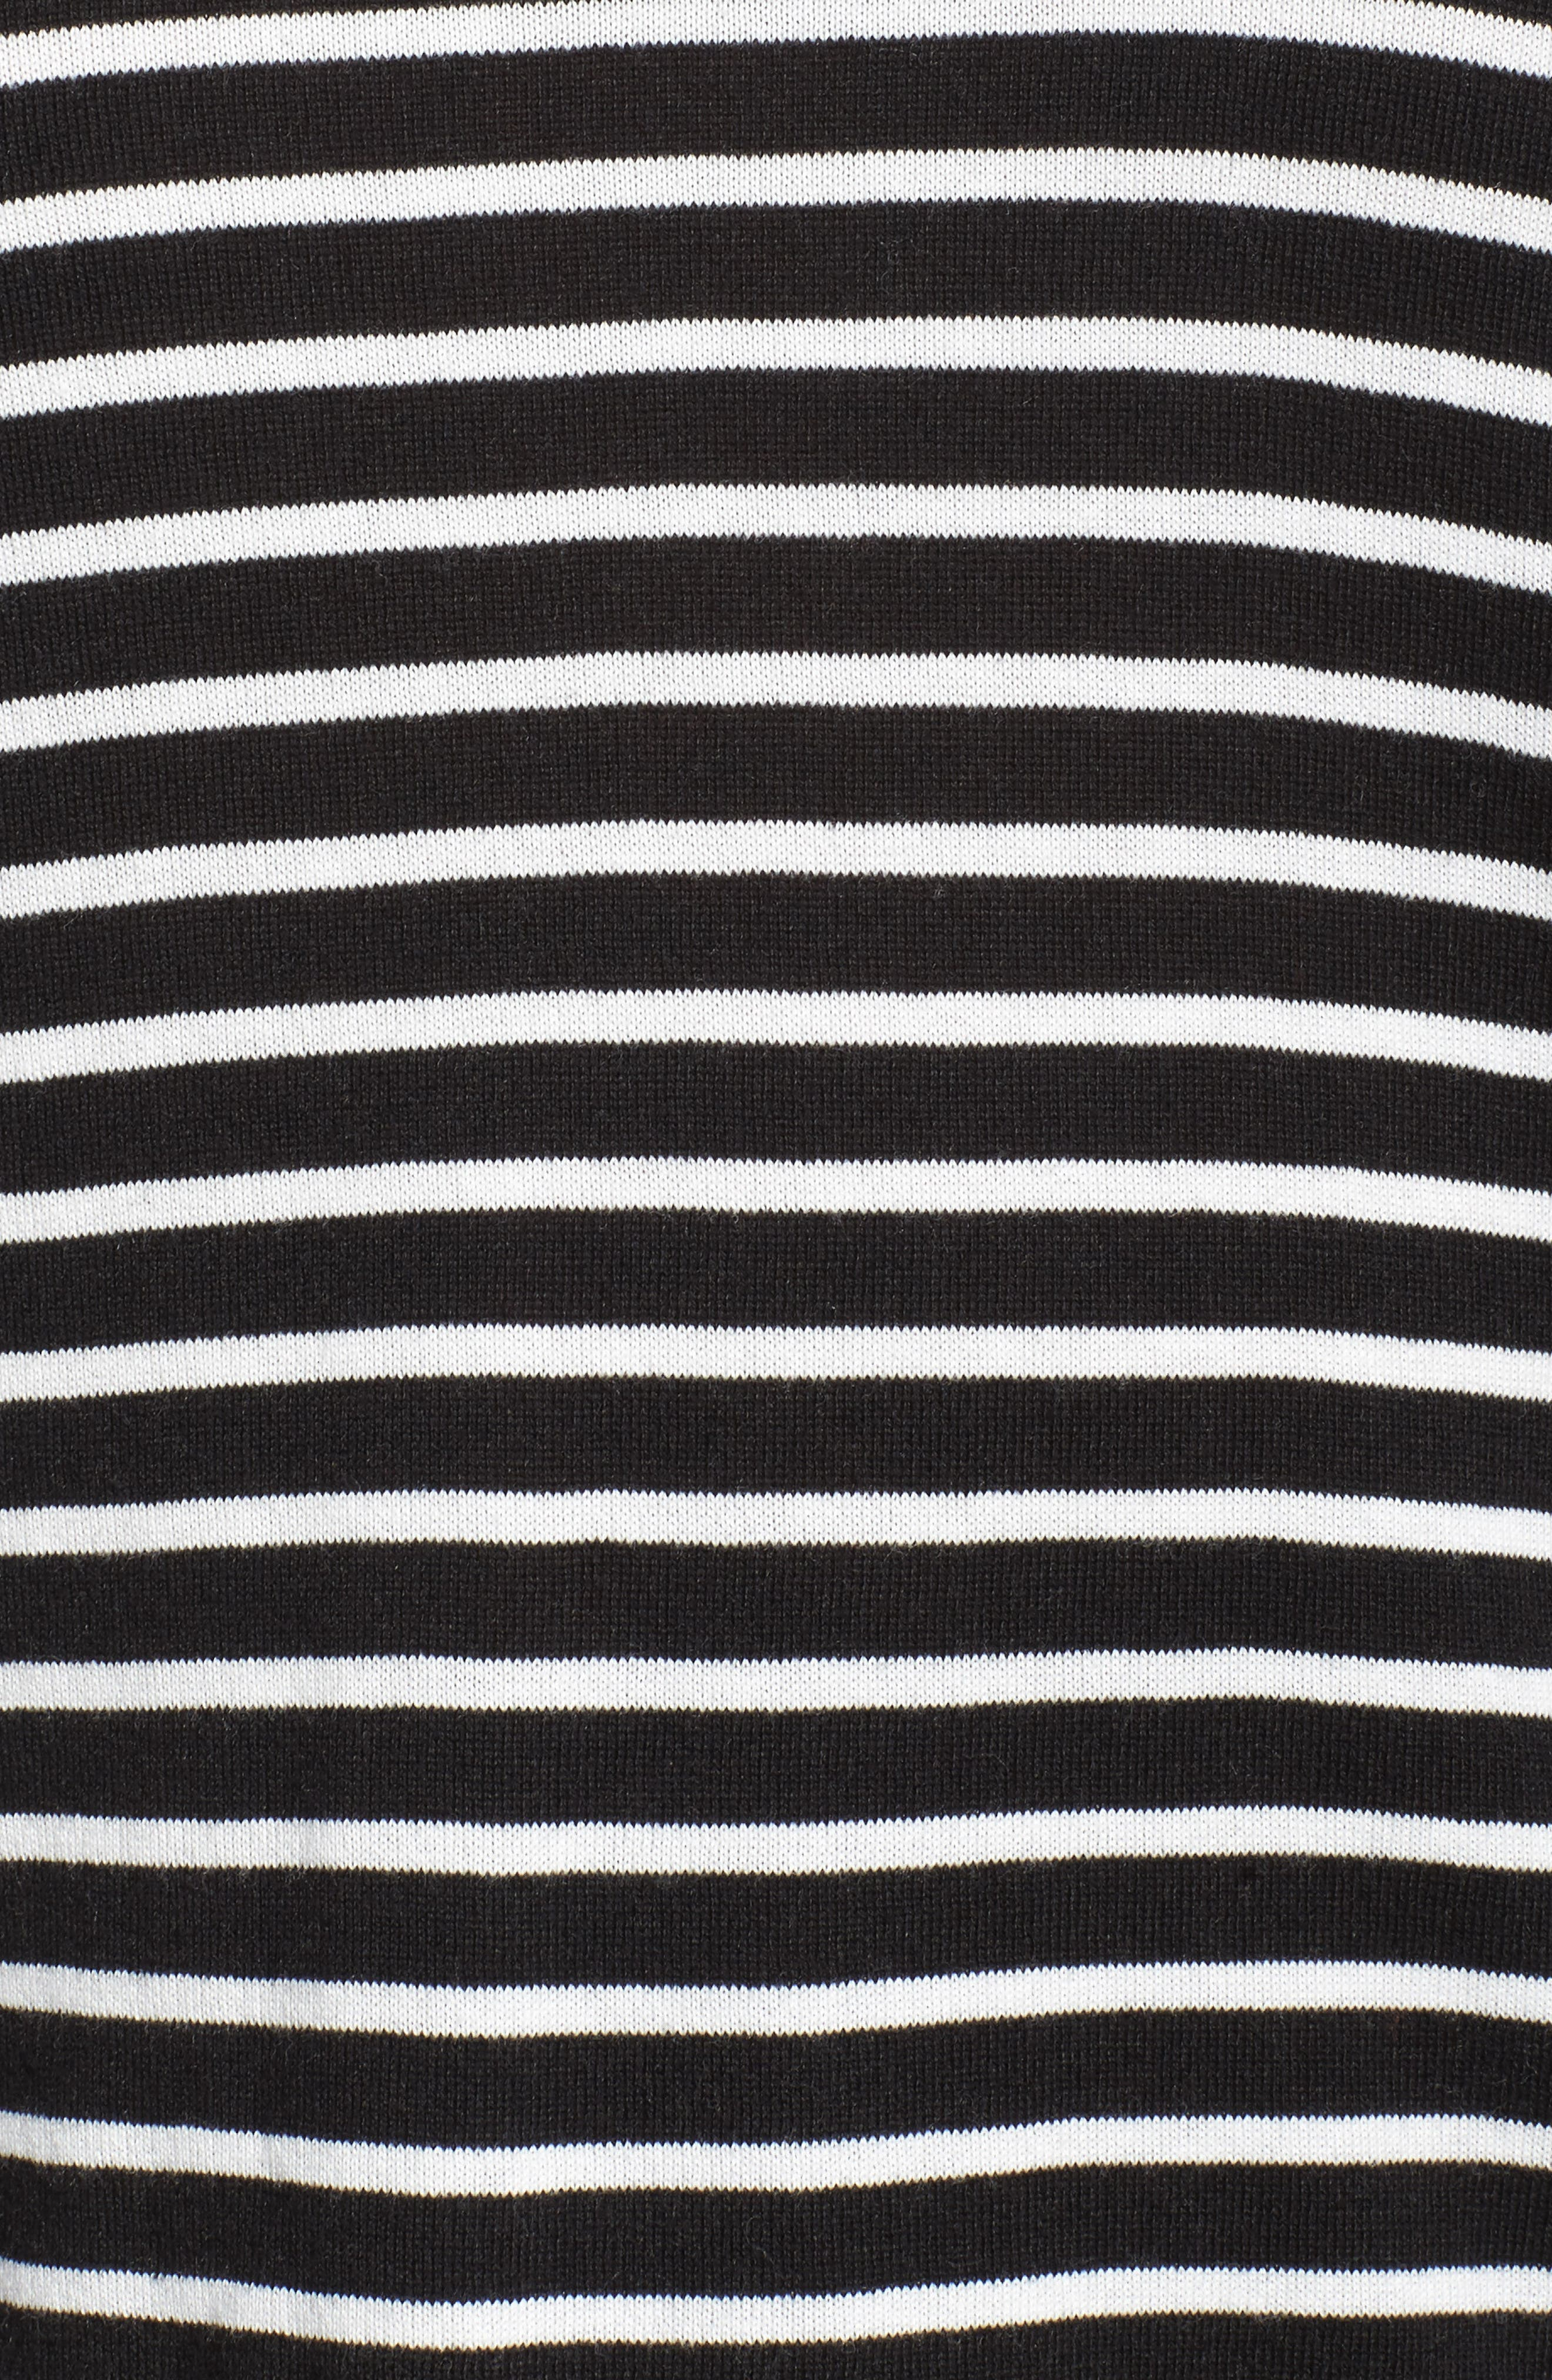 Dolman Sleeve Crewneck Sweater,                             Alternate thumbnail 21, color,